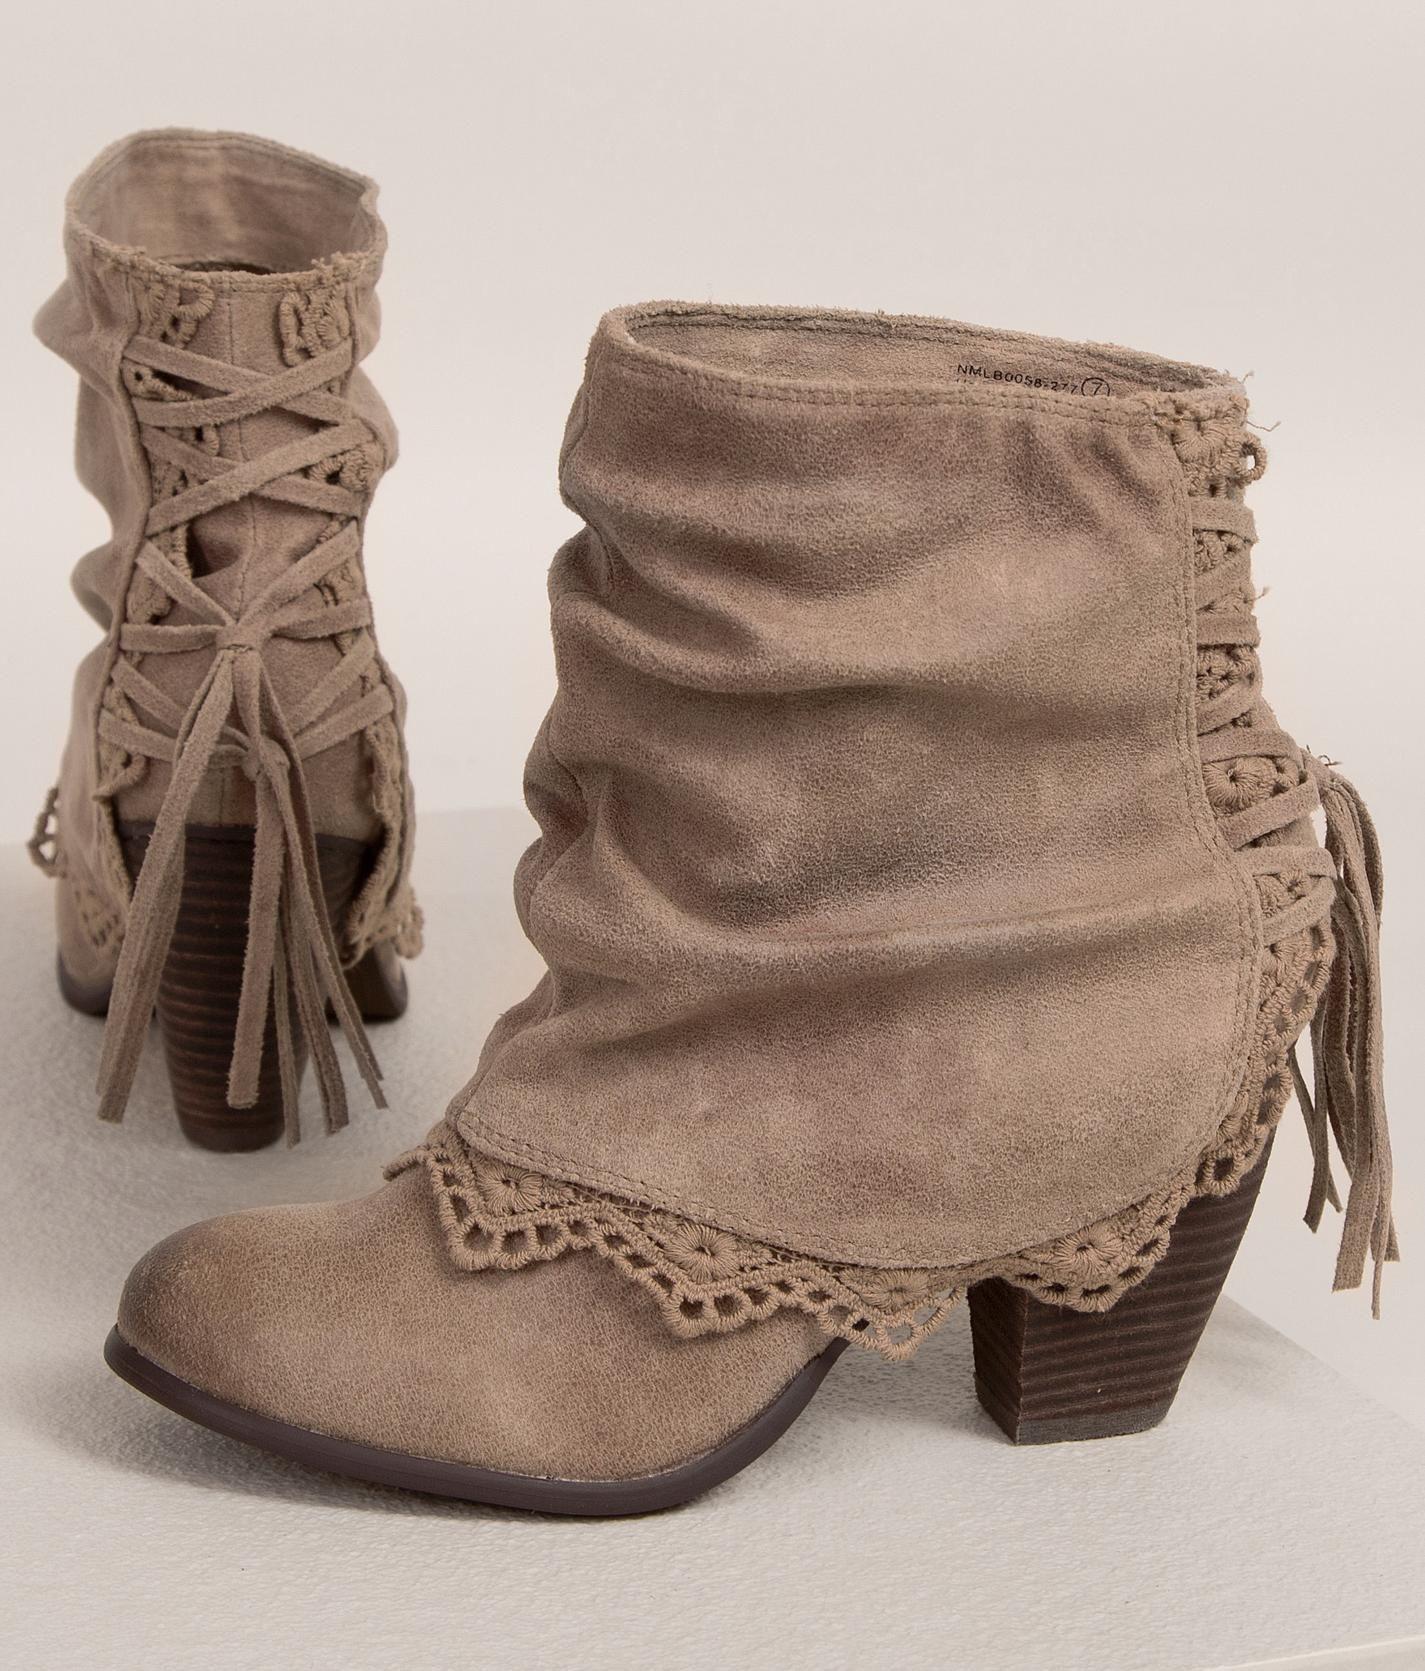 Naughty Monkey Fireball Boot - Women's Shoes | Buckle